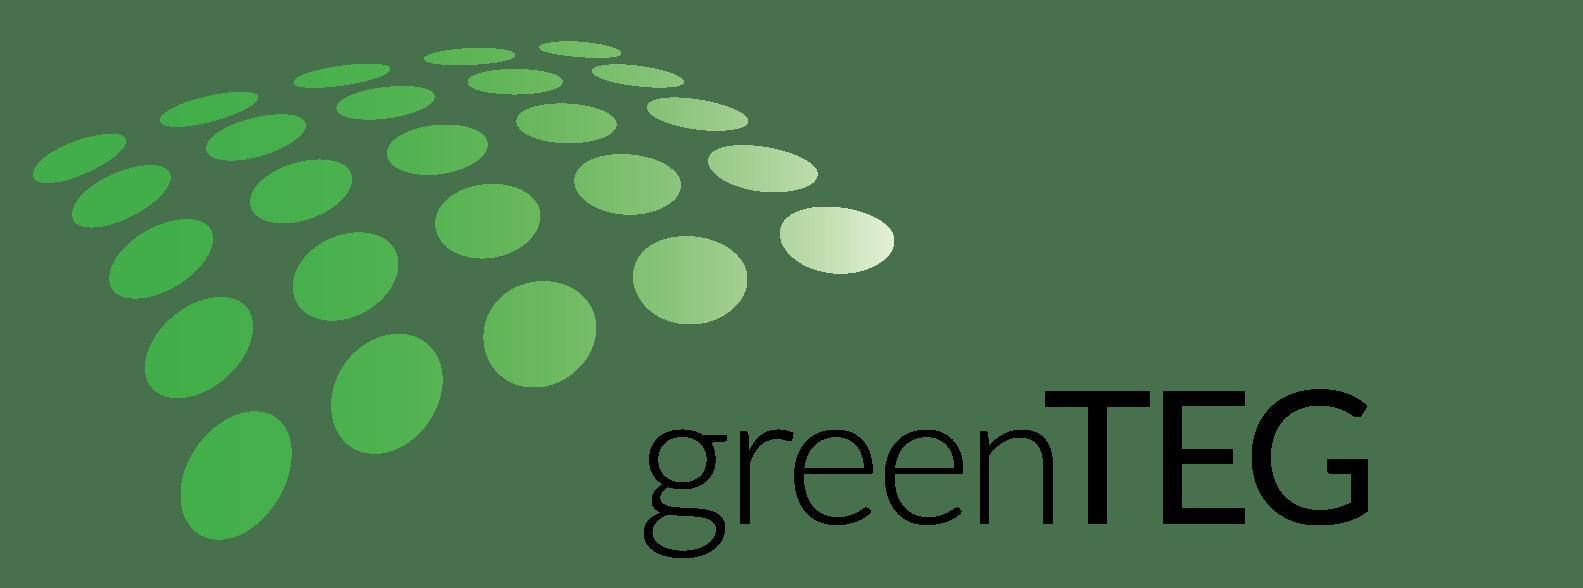 green TEG corporate logo